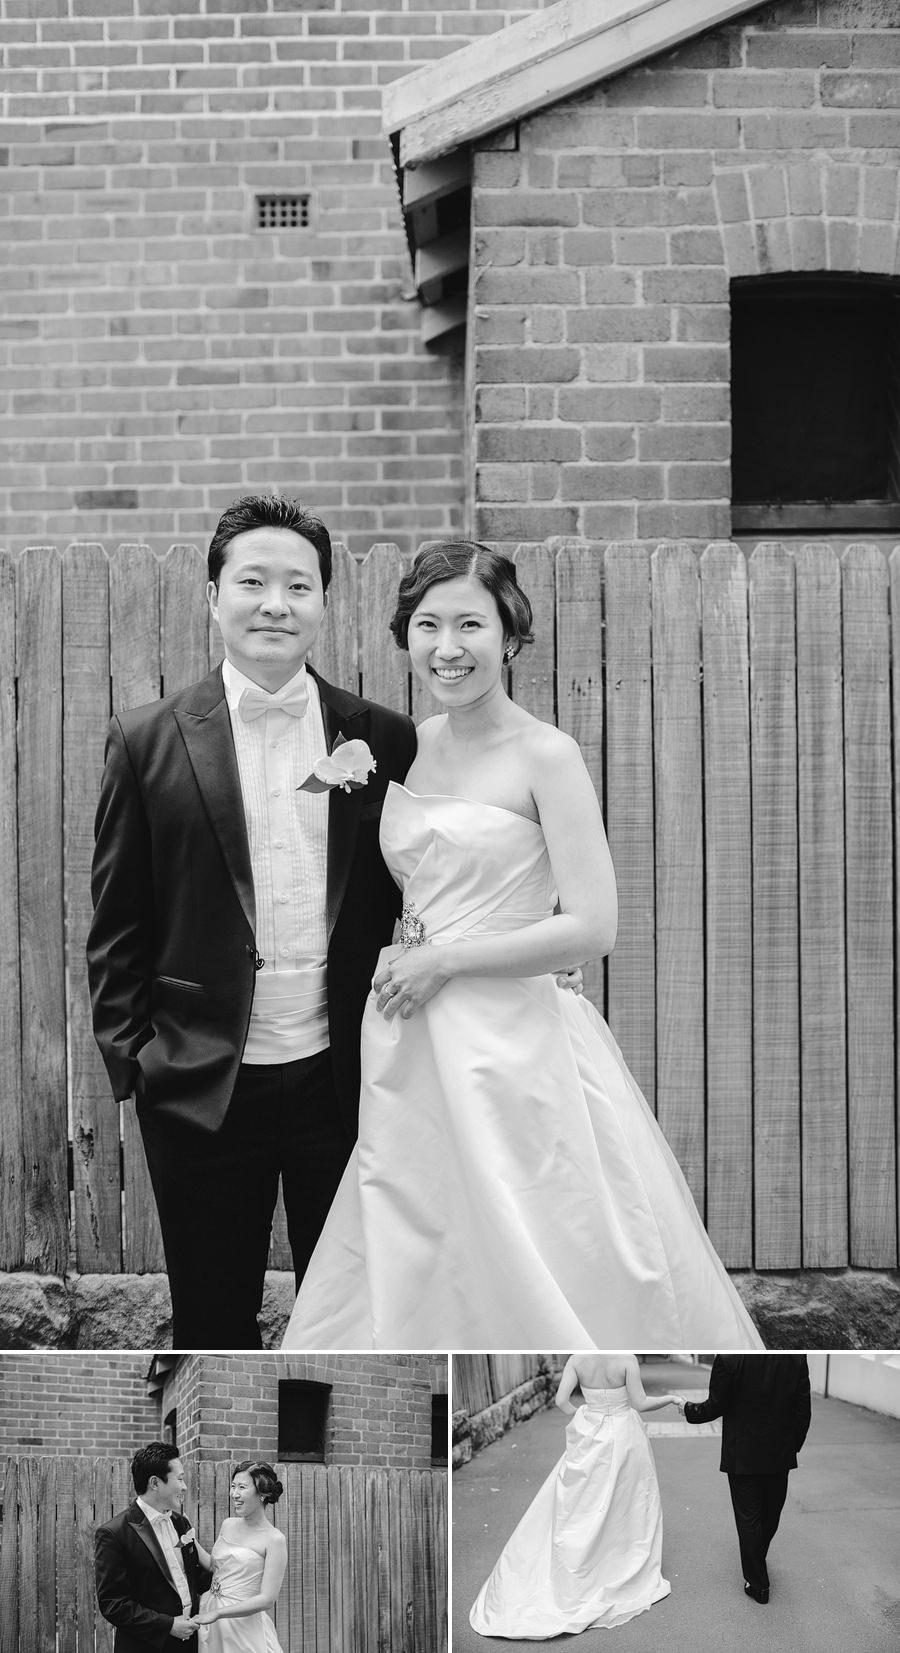 The Rocks Wedding Photographer: Bride & Groom